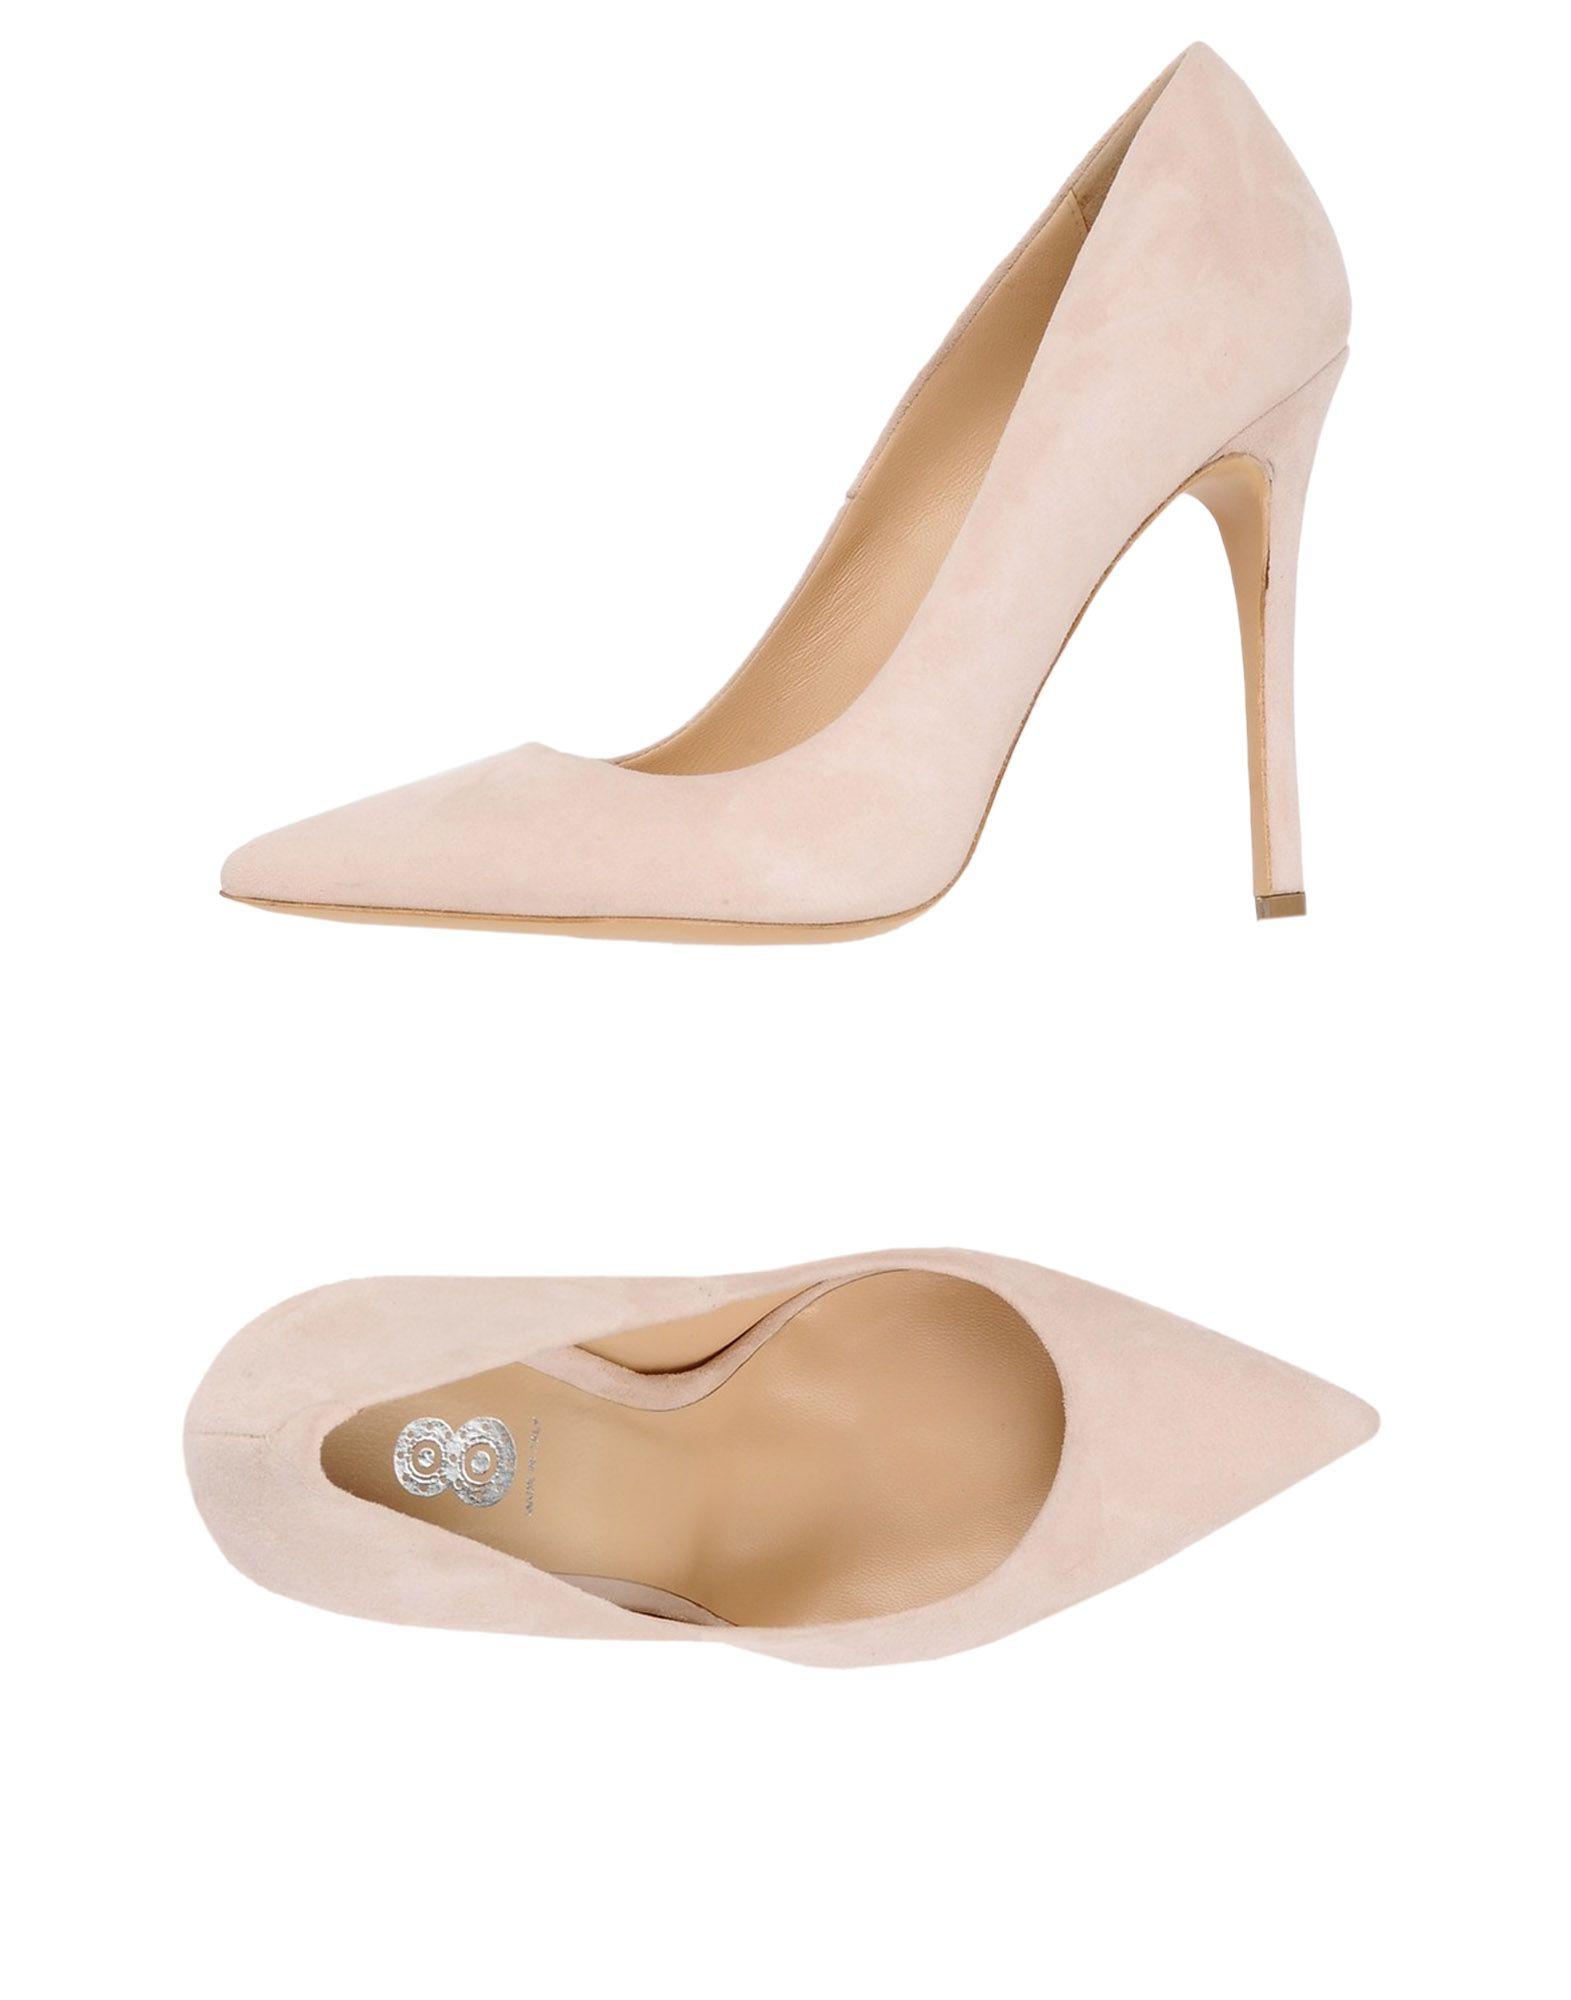 8 Pumps Damen  11444072JE Gute Qualität beliebte Schuhe